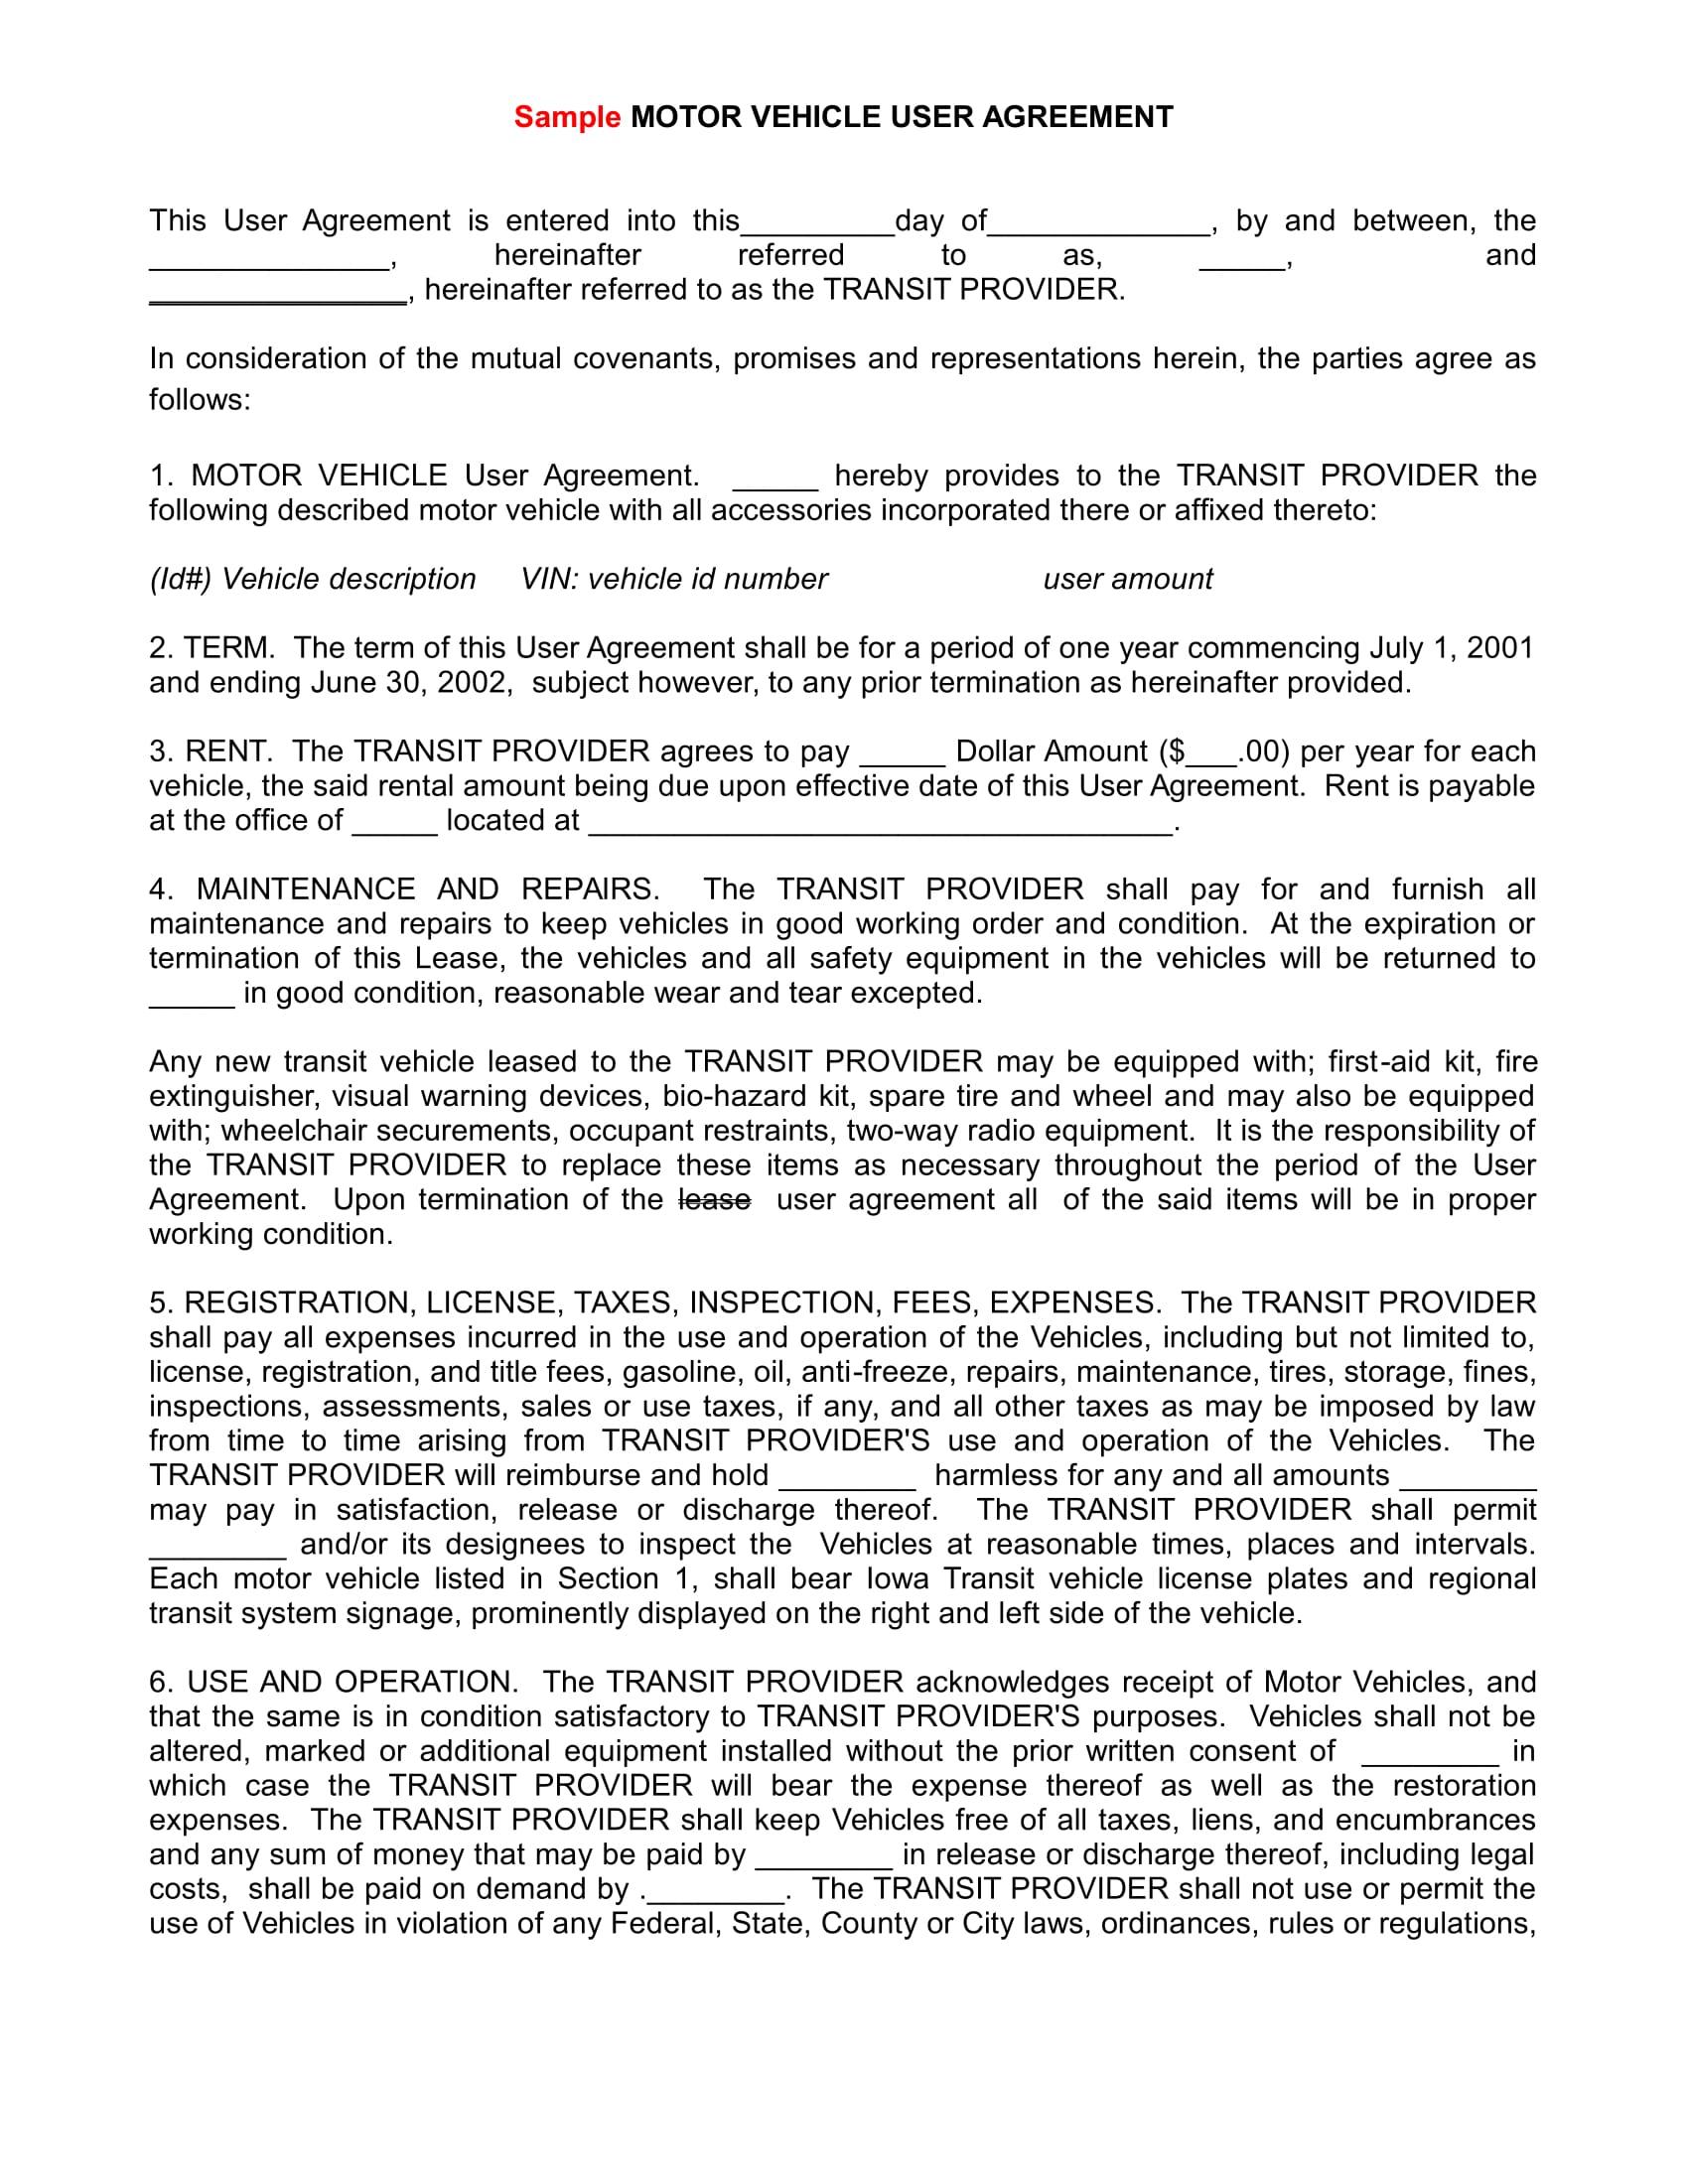 motor vehicle user agreement example